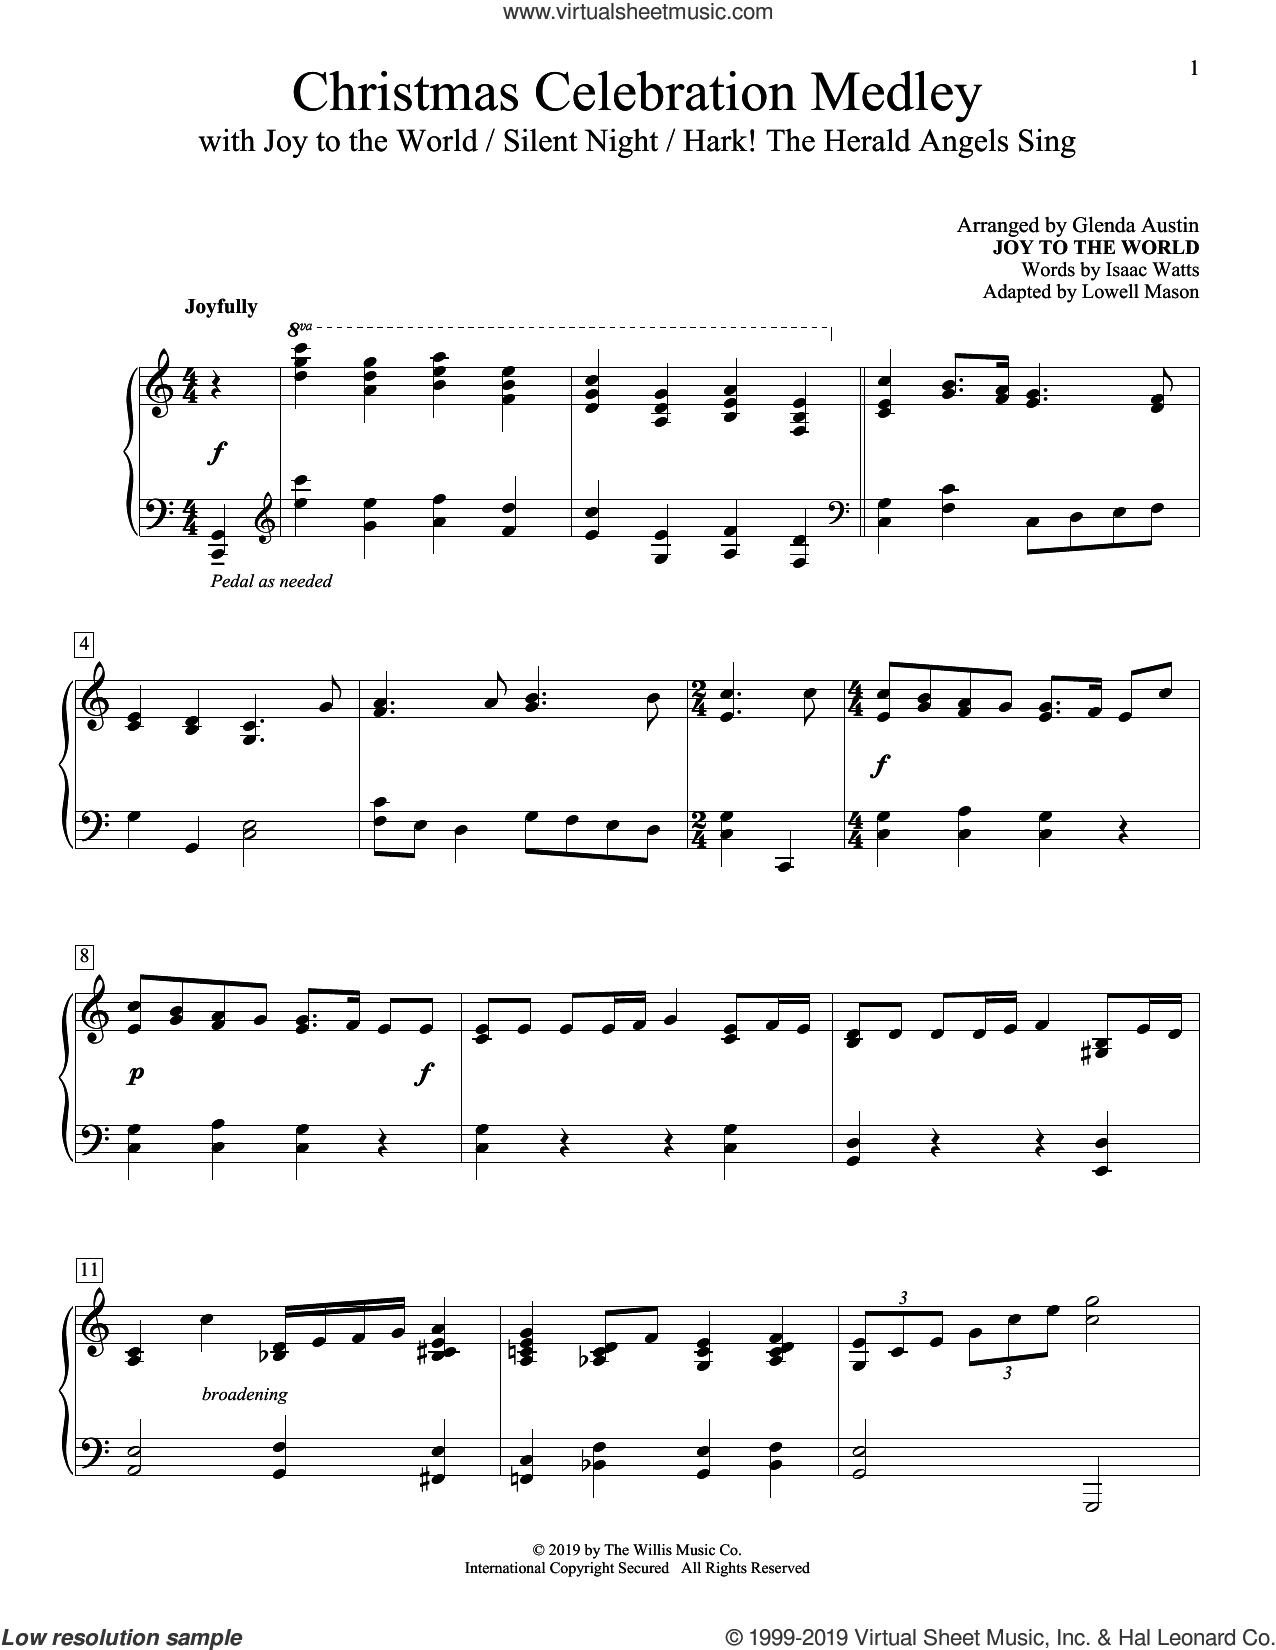 Christmas Celebration Medley sheet music for piano solo by Glenda Austin, intermediate skill level